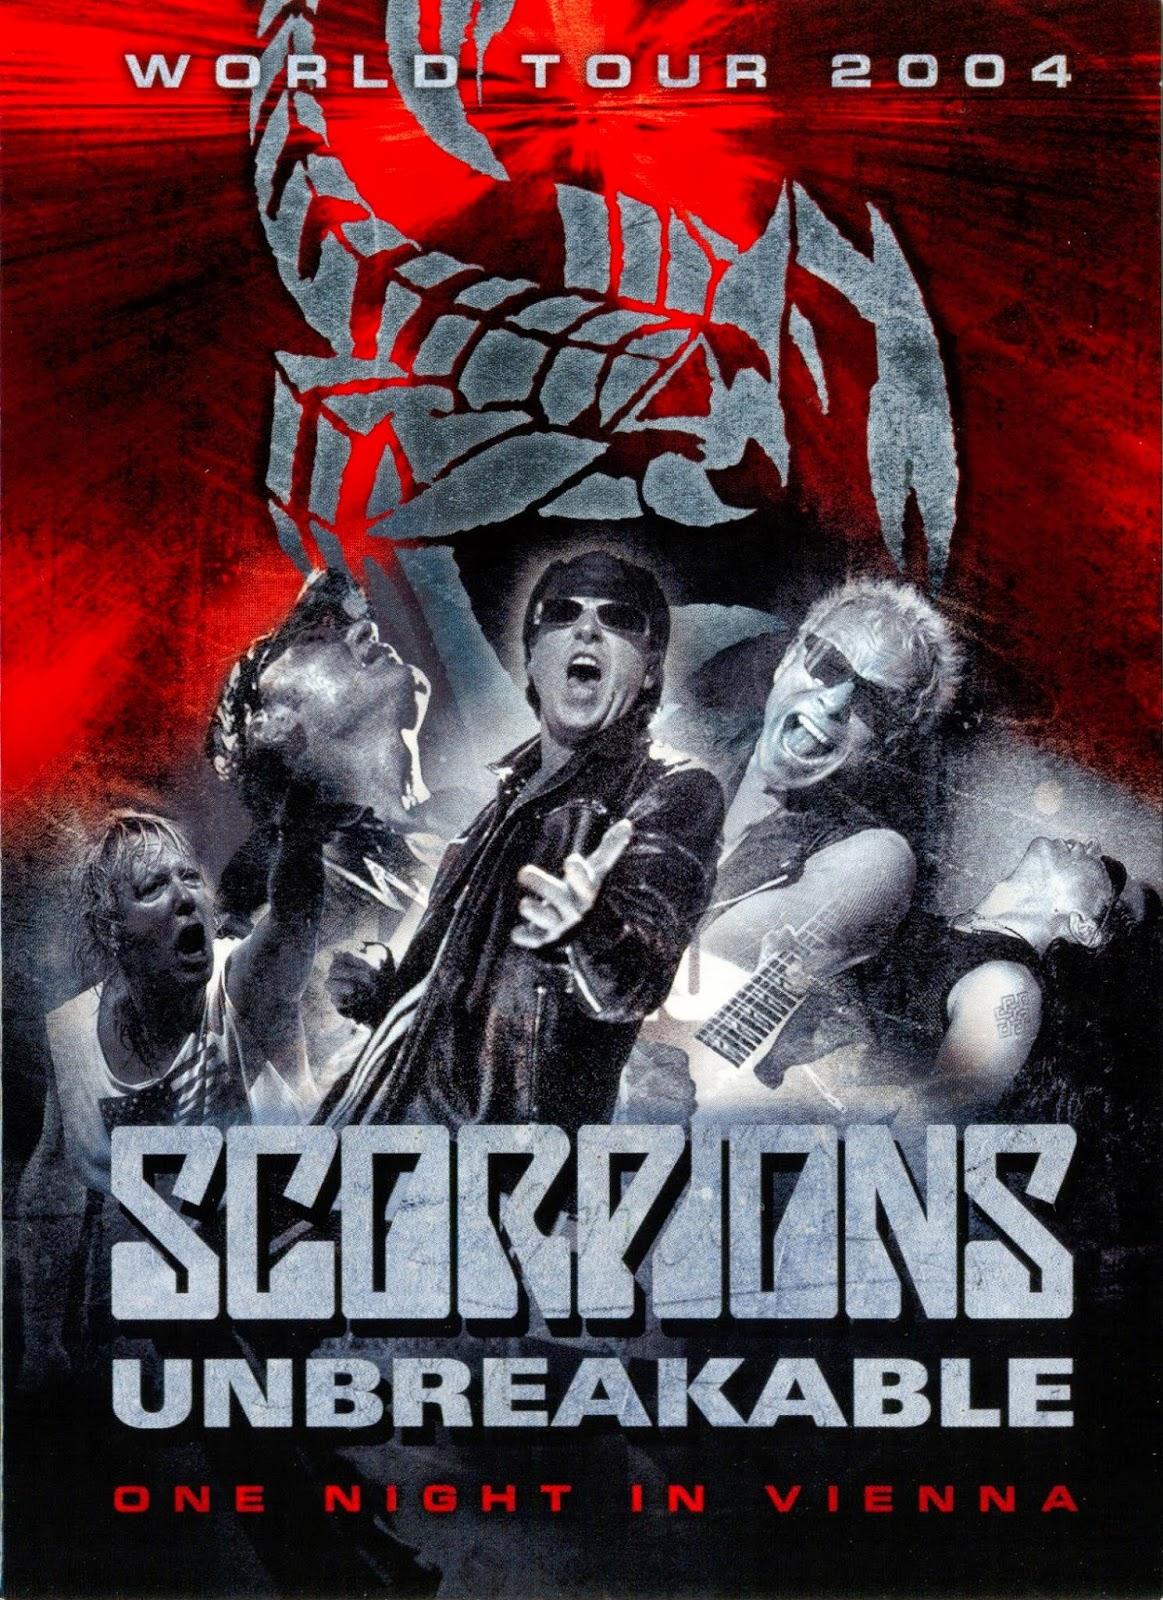 Scorpions lonely nights скачать mp3 бесплатно